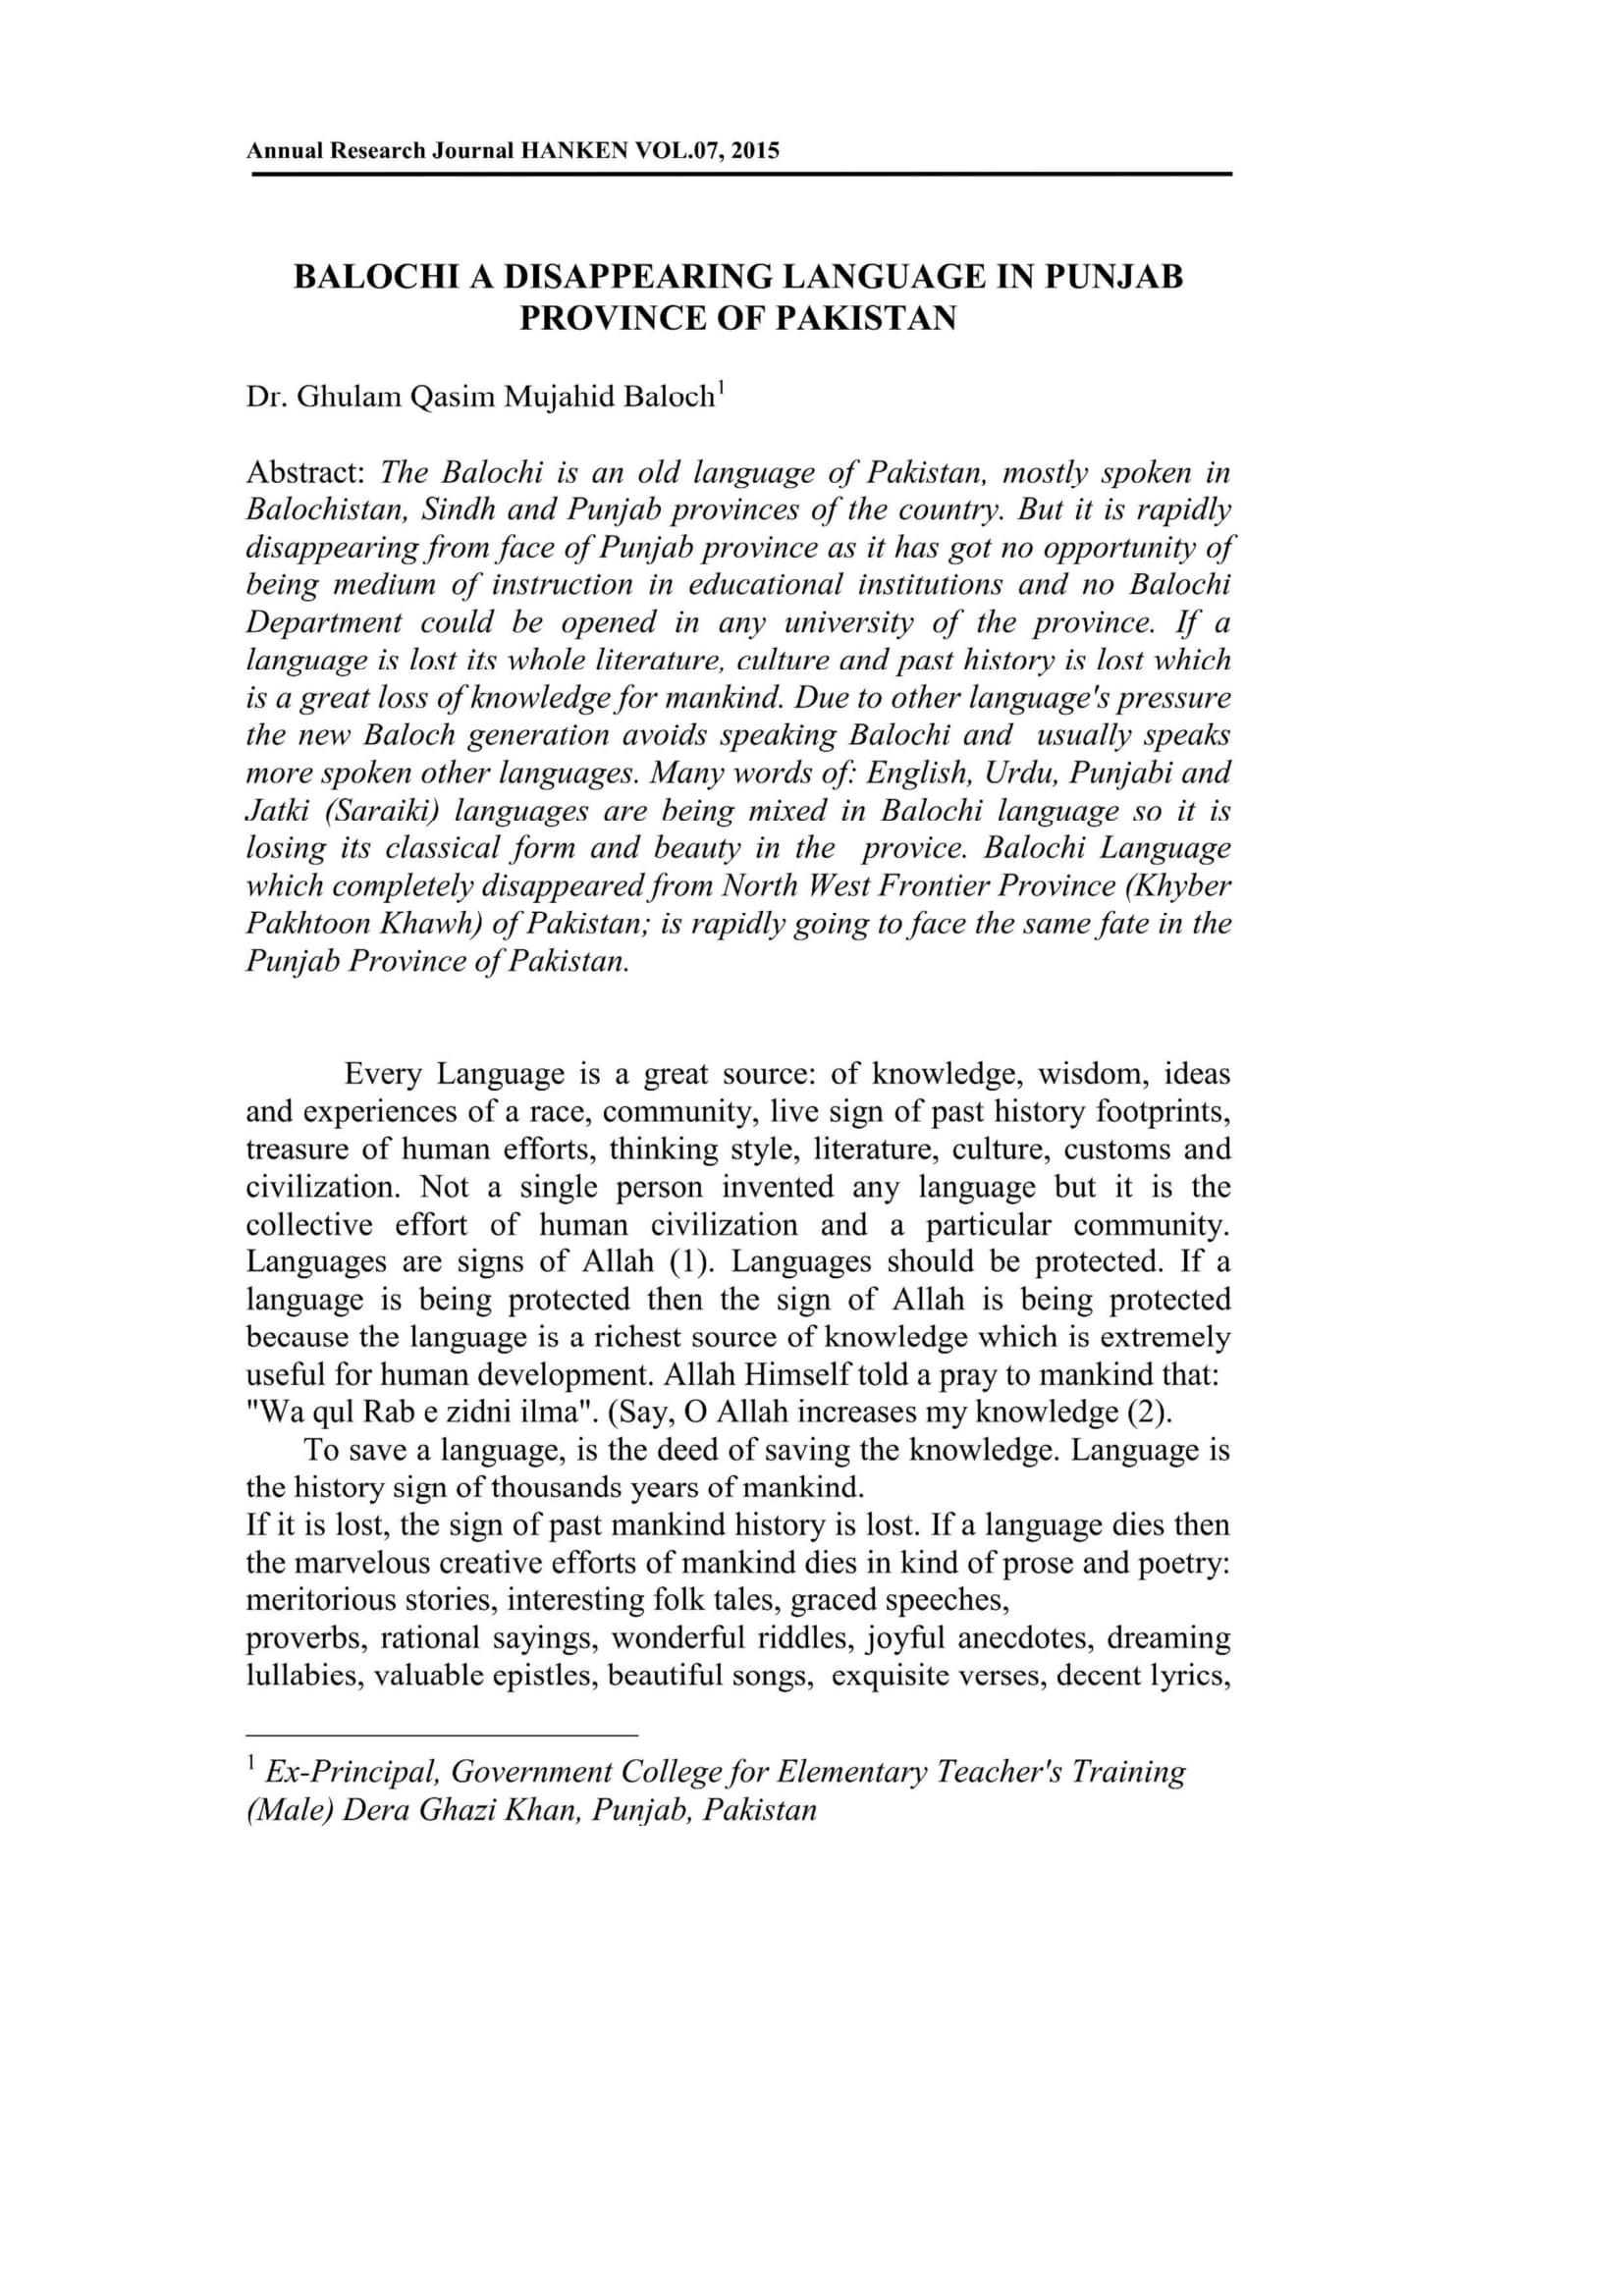 BALOCHI A DISAPPEARING LANGUAGE IN PUNJAB PROVINCE OF PAKISTAN